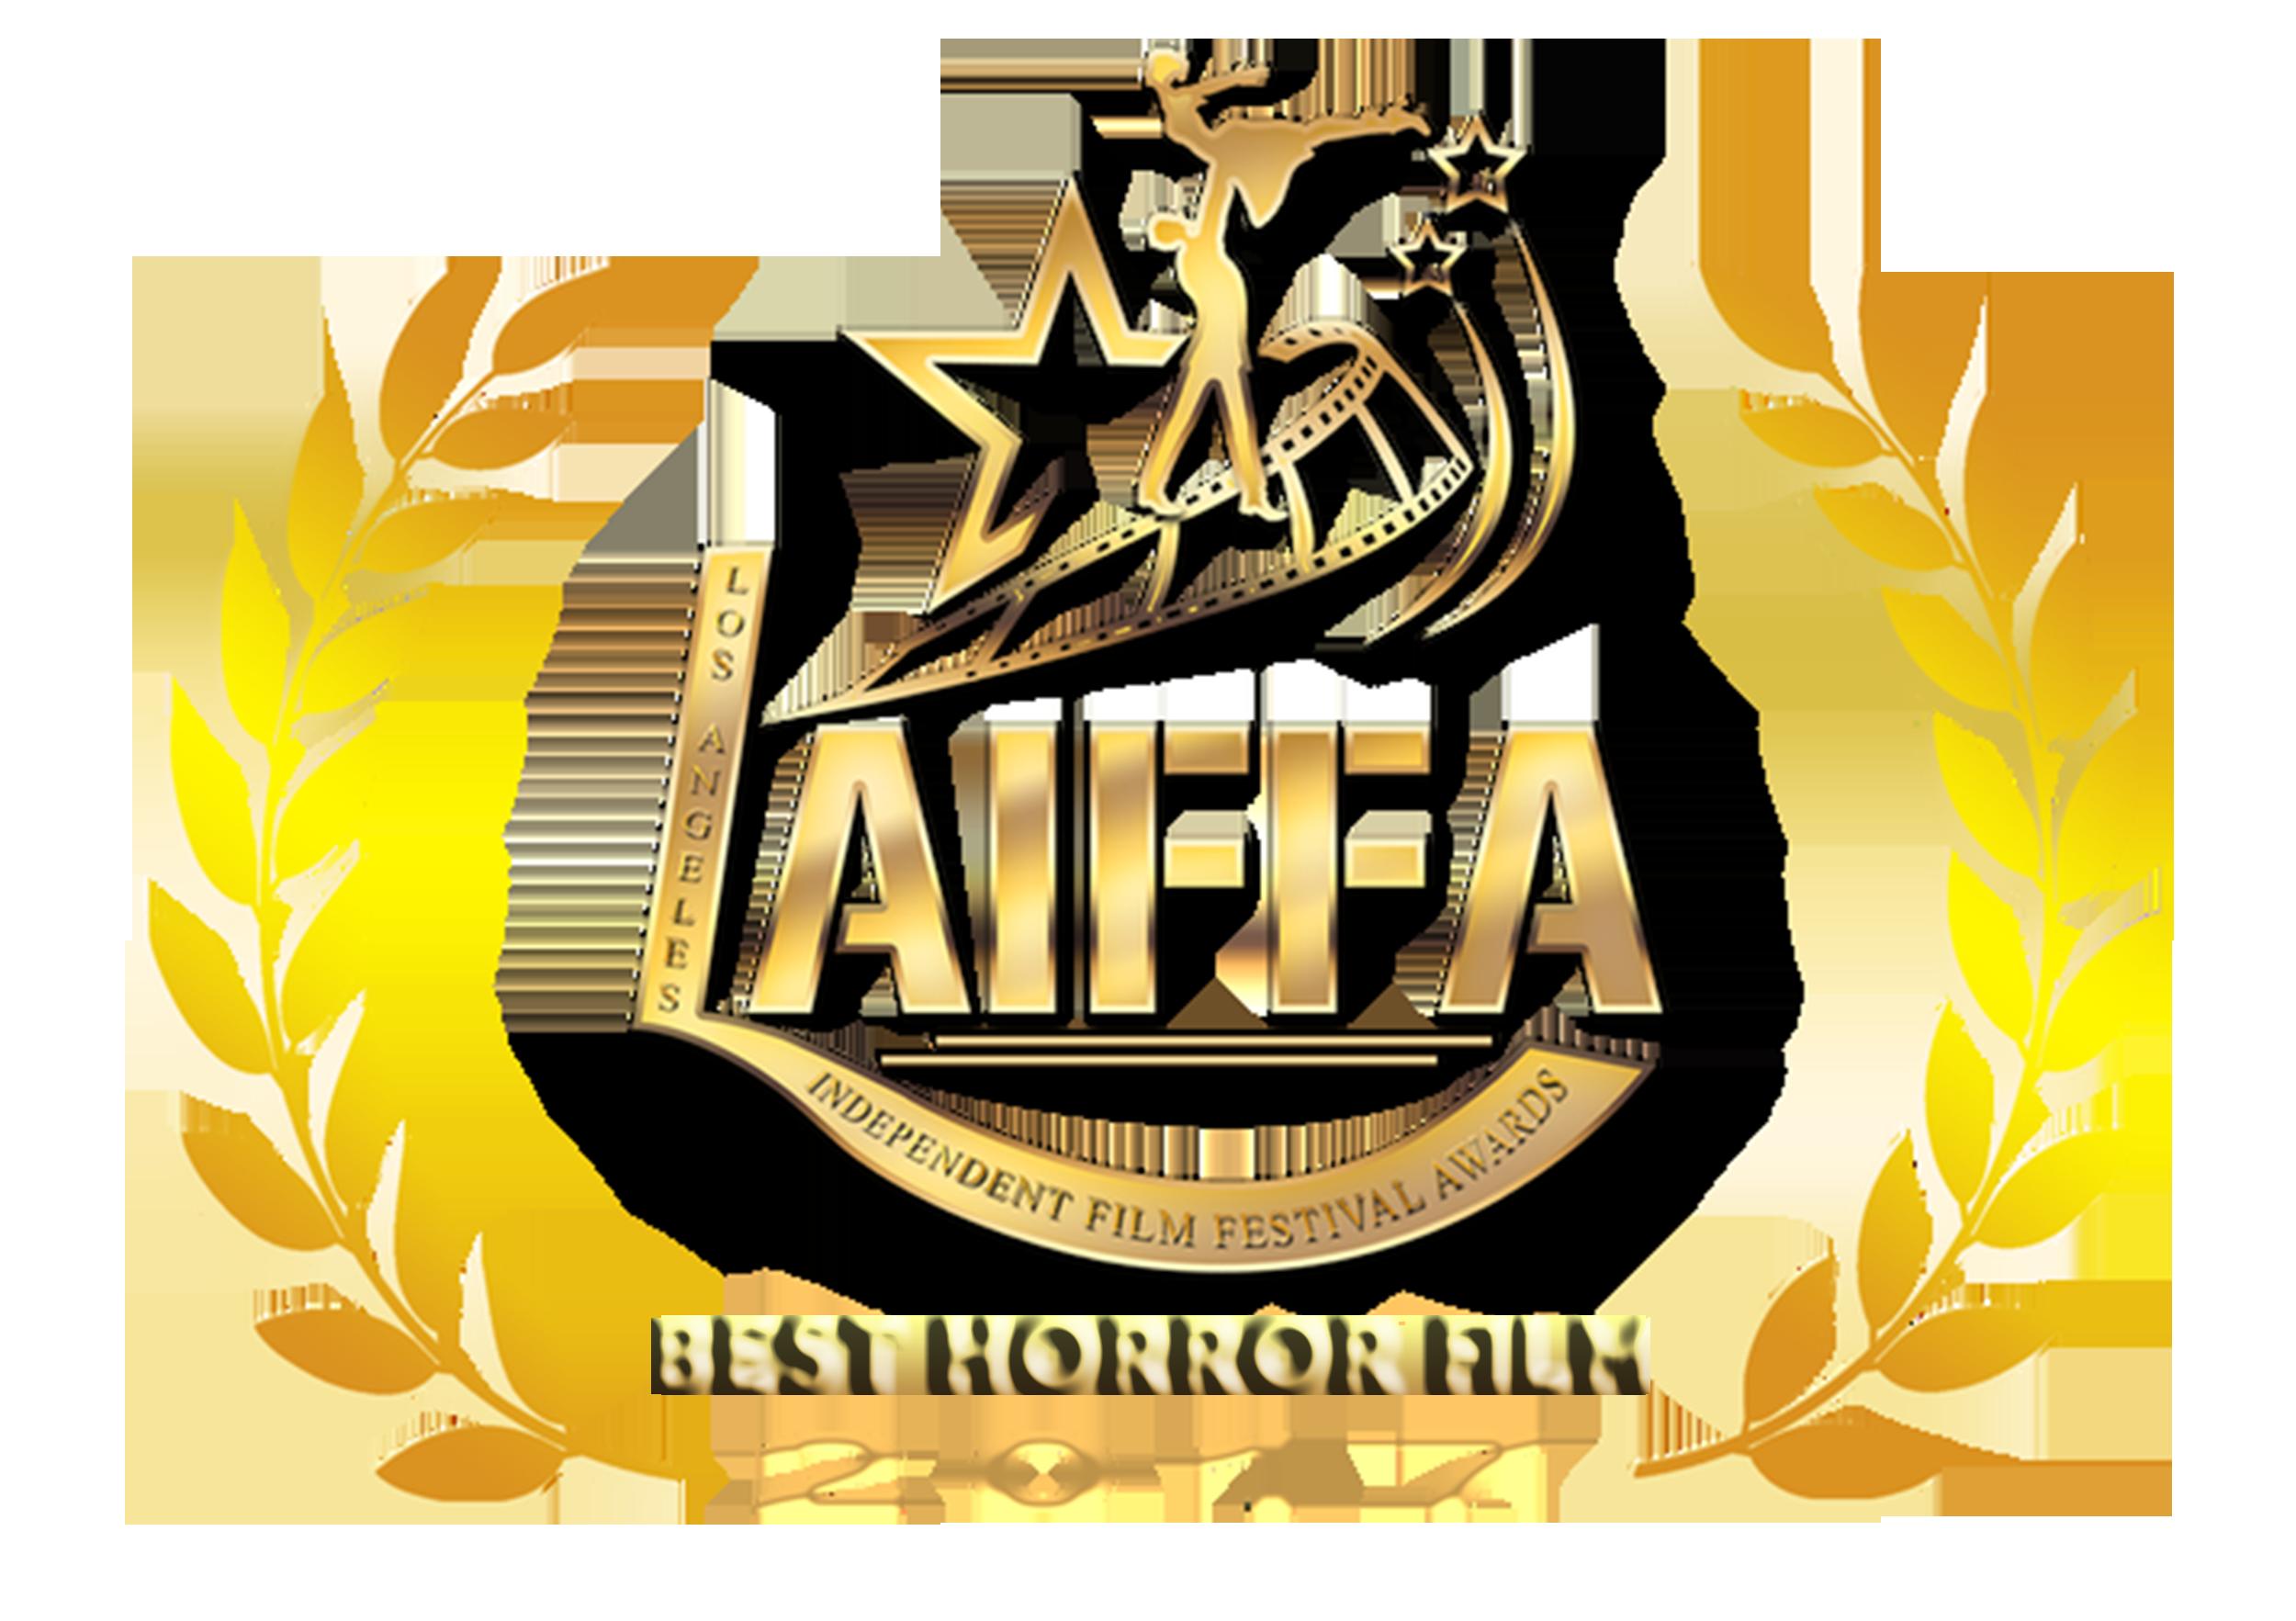 LAIFFA BEST HORROR FILM.png